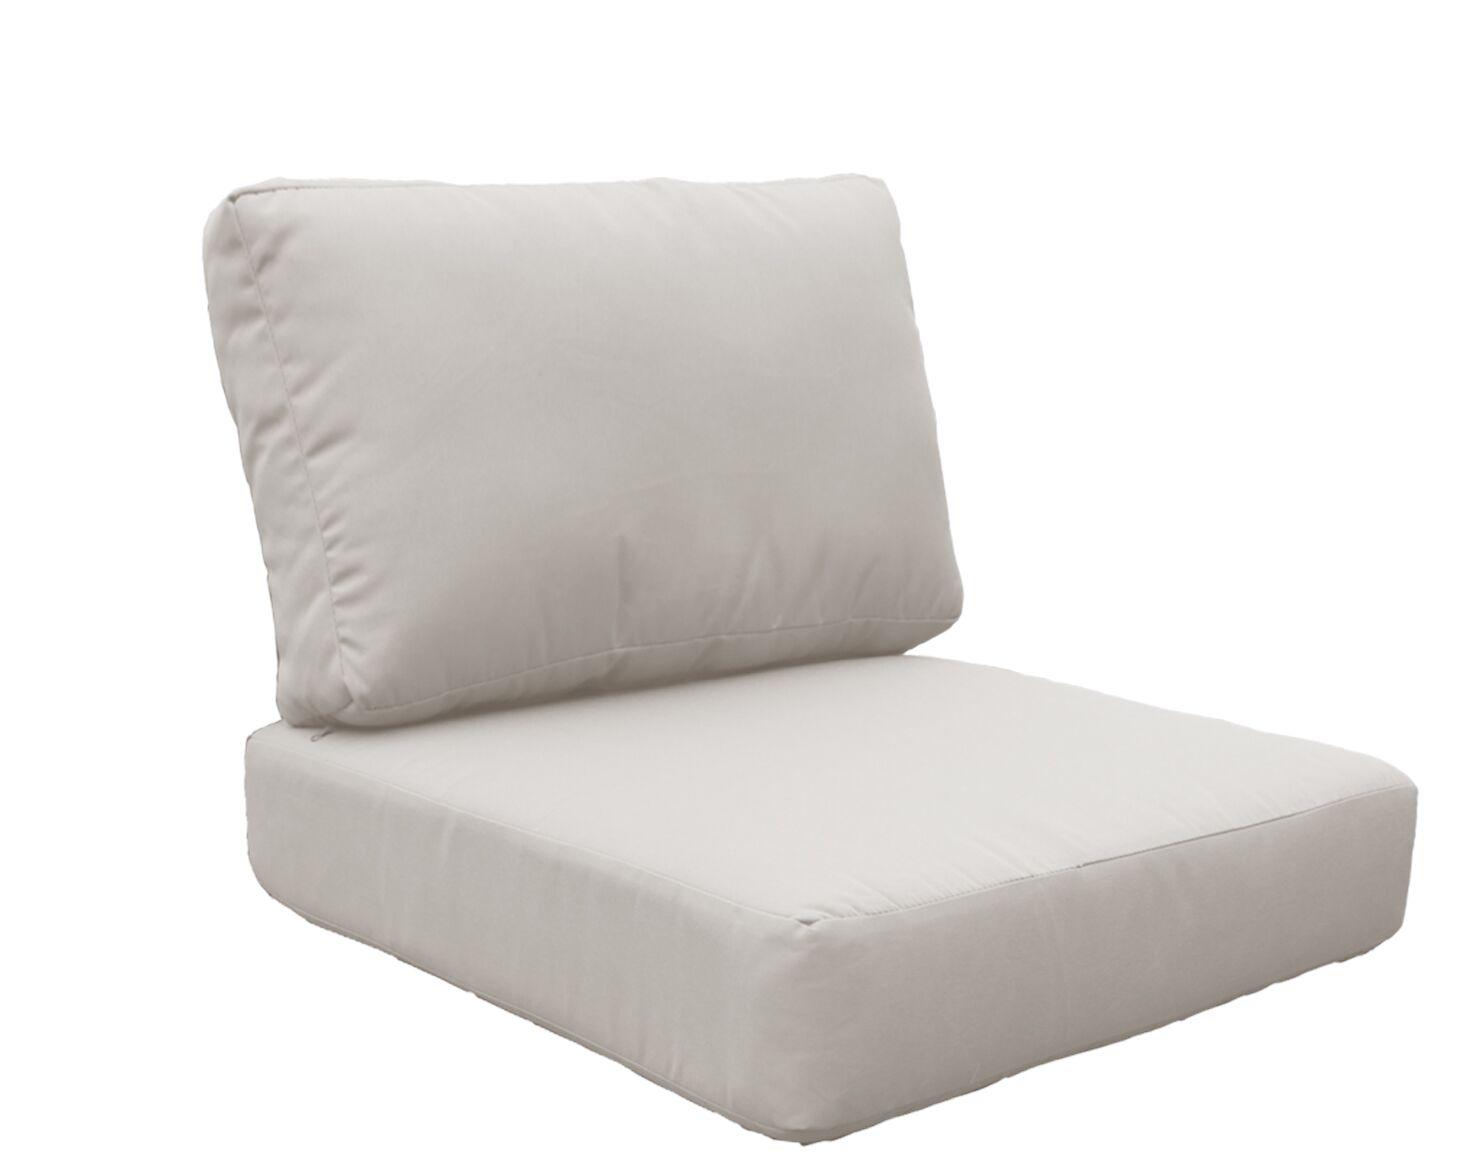 Miami 6 Piece Outdoor Lounge Chair Cushion Set Fabric: Beige